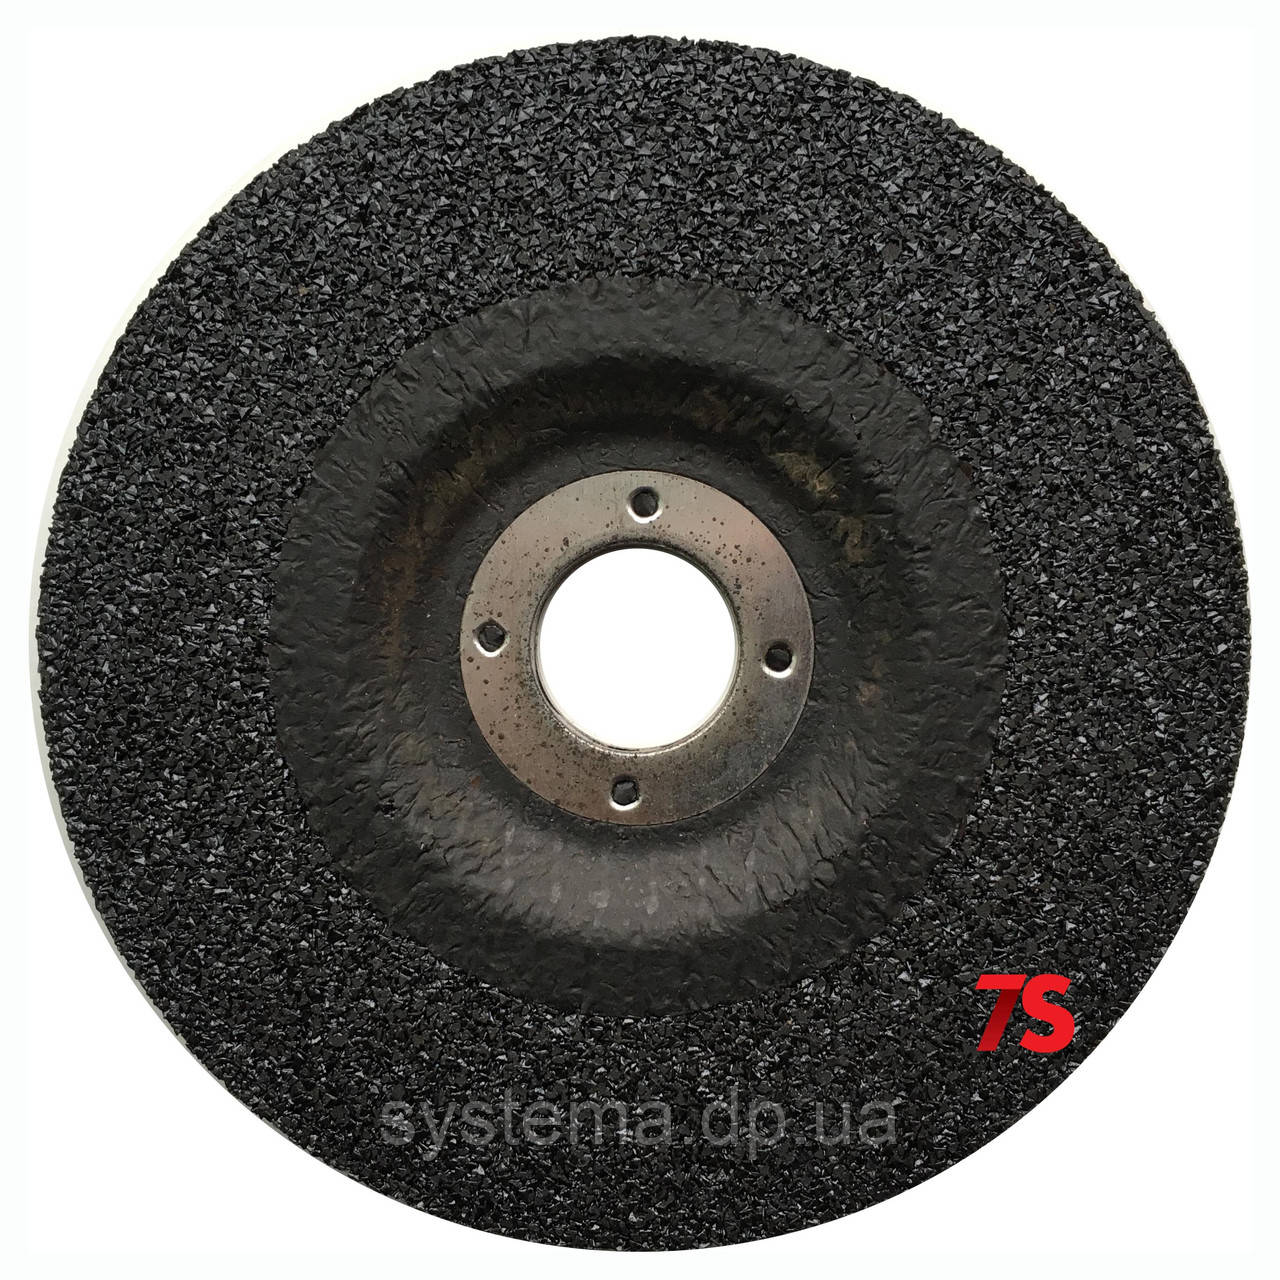 3M 51747 - Зачисной круг по металлу Silver T27, 115х22,23х7,0 мм